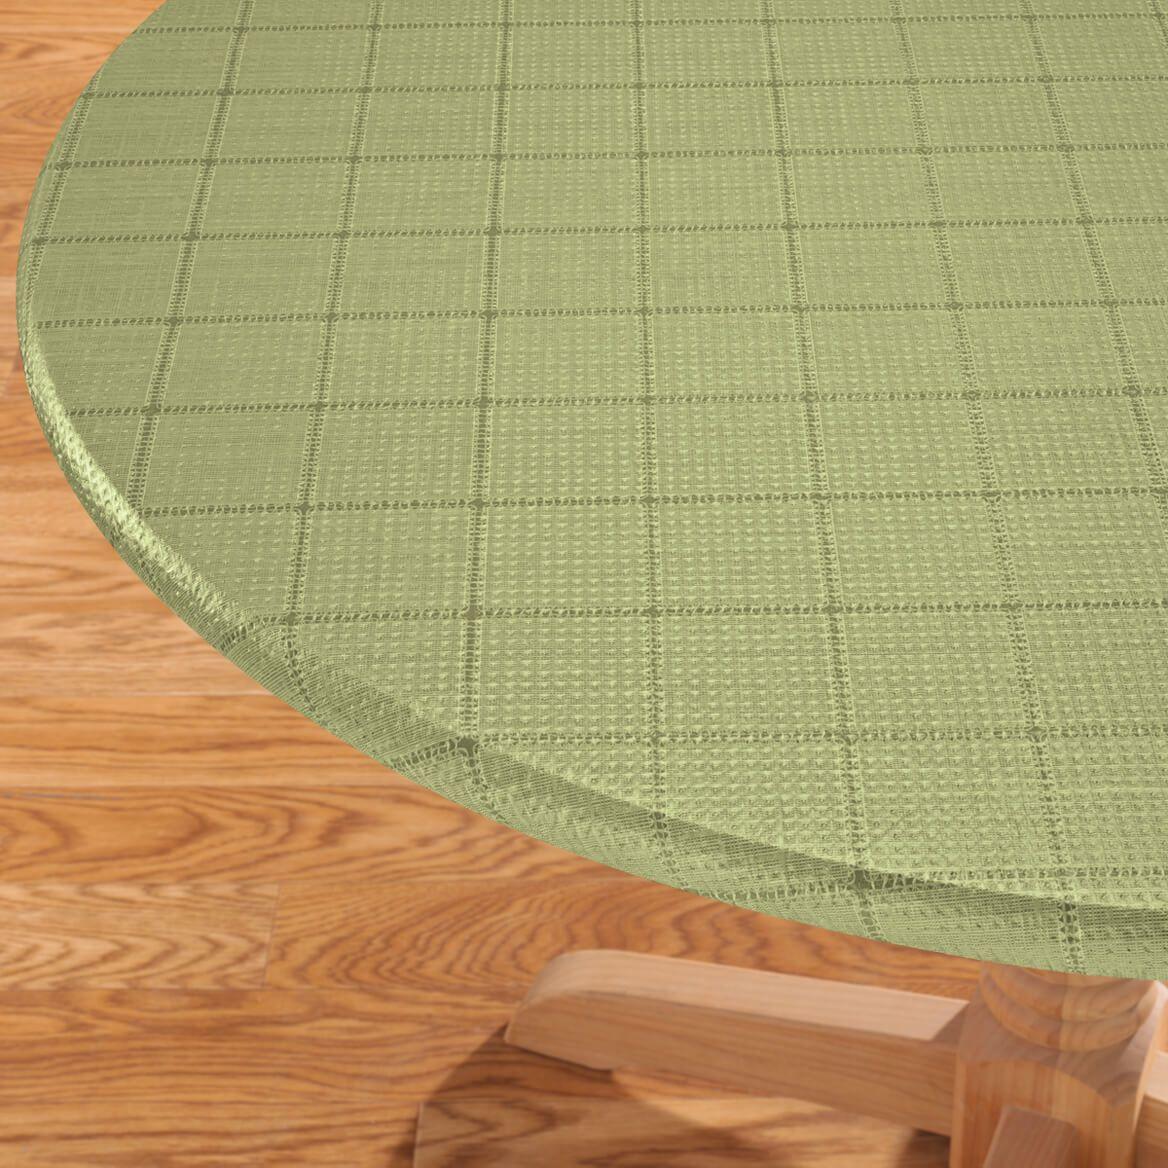 Woven Lattice Elasticized Tablecover-344556